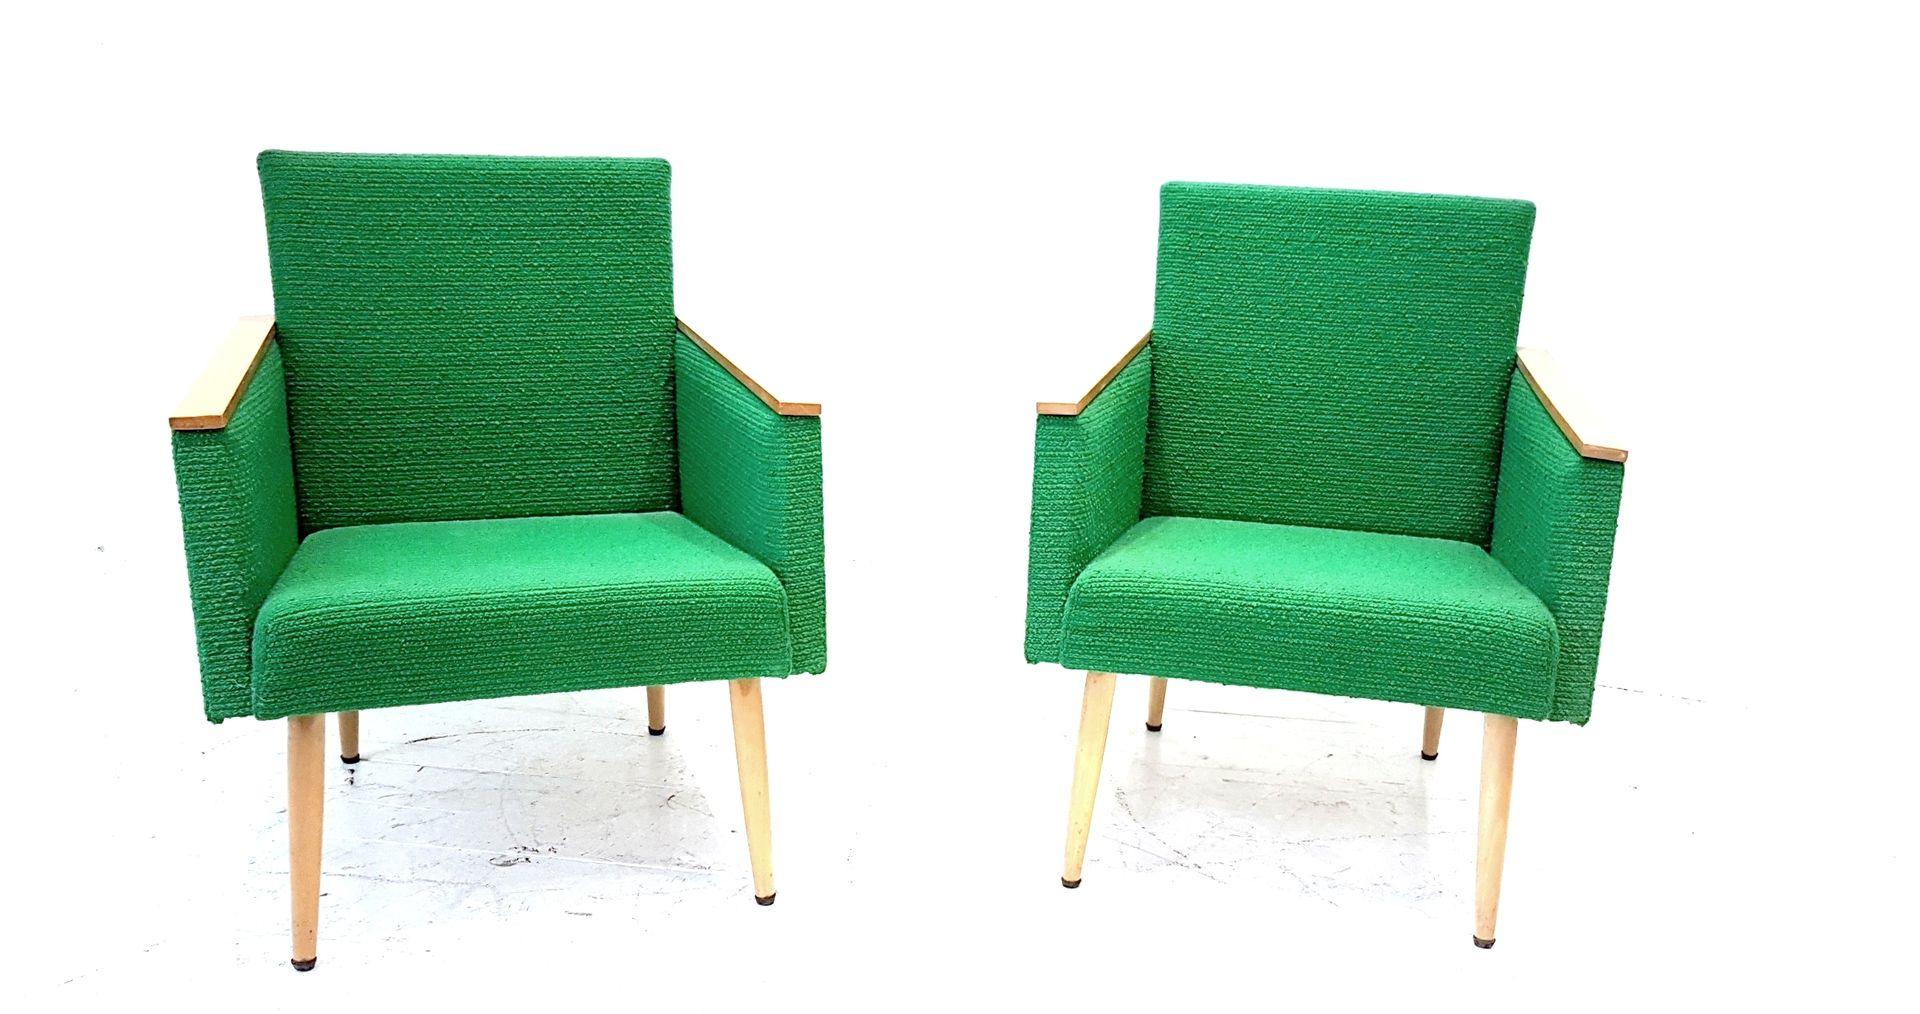 Clubsessel aus naturbelassener Buche mit grünem Stoff, 1960er, 2er Set